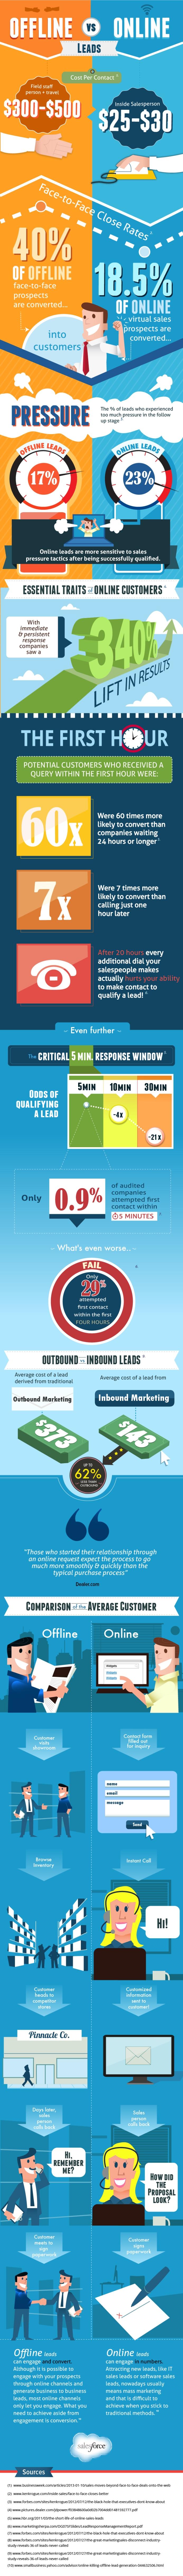 convert-online-sales-lead